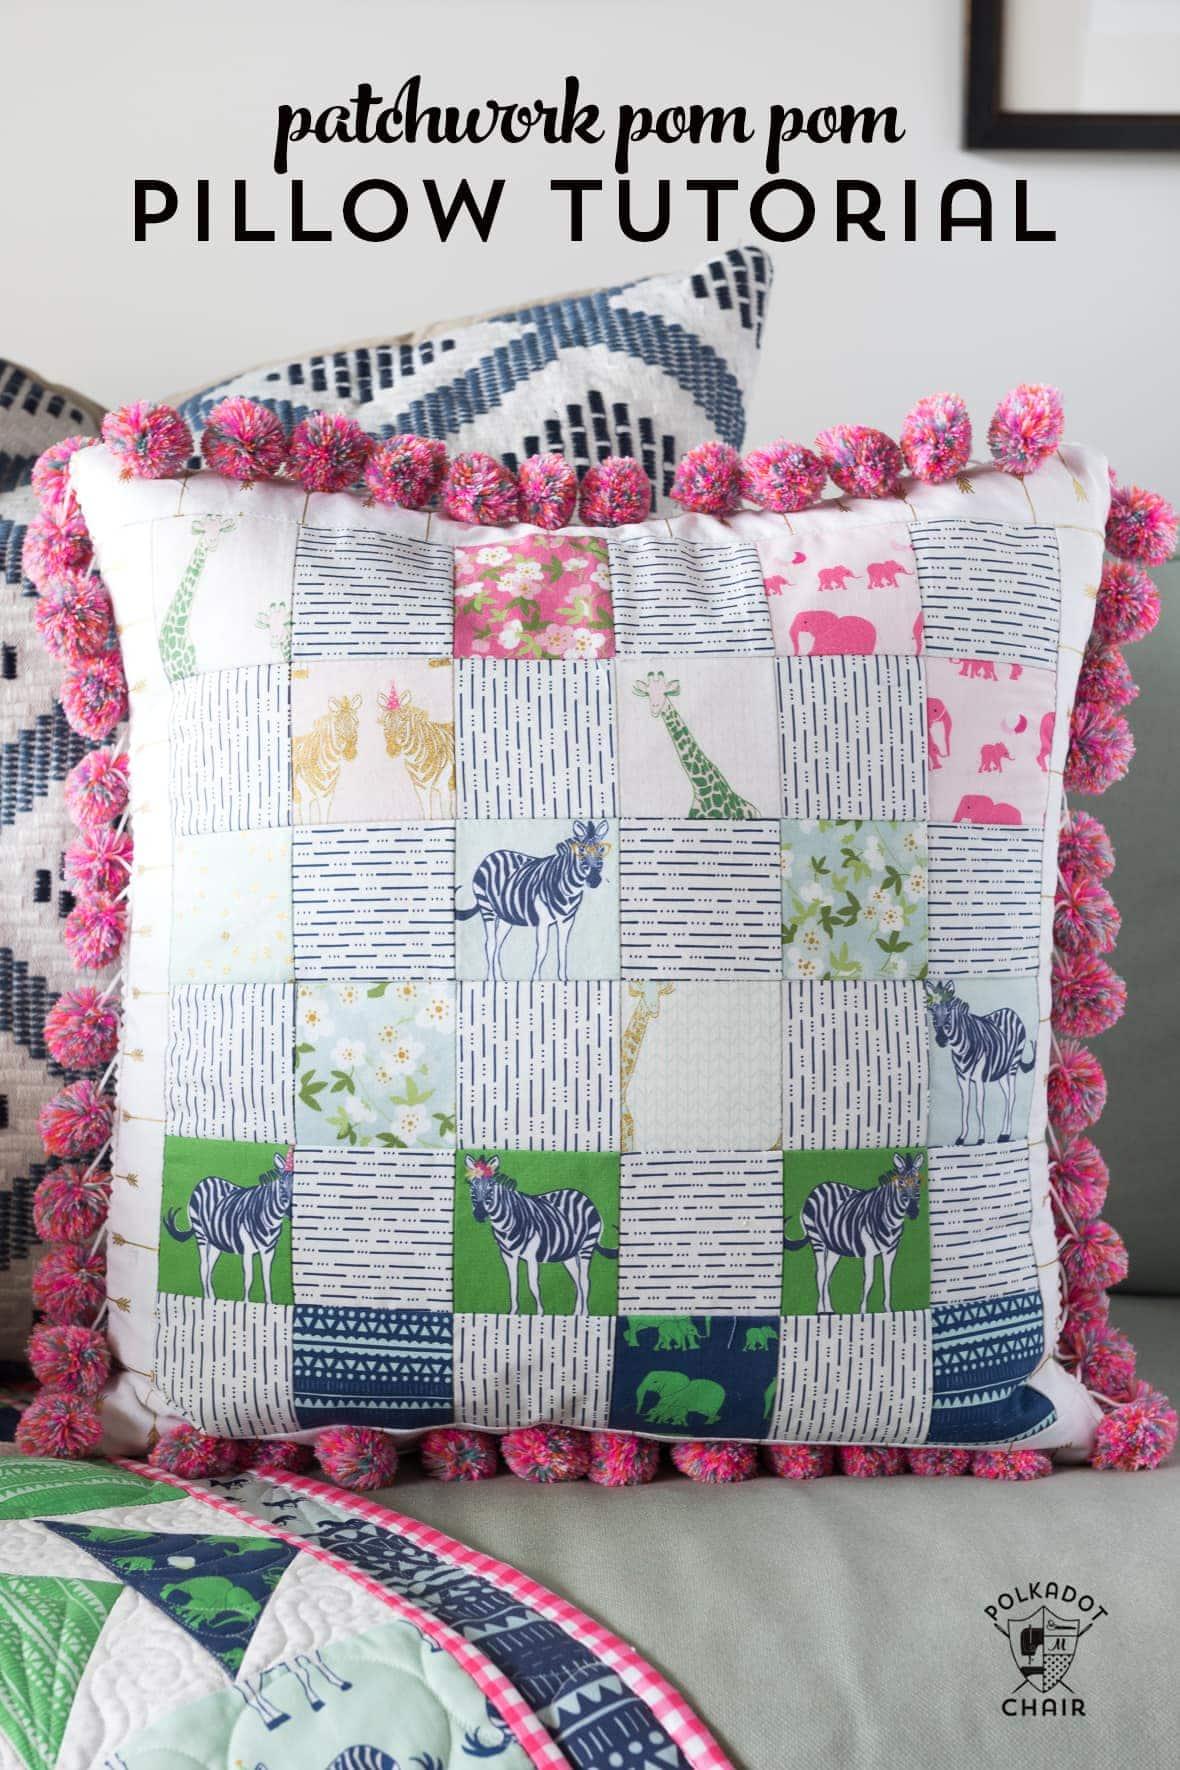 Pom Pom Patchwork Pillow Pattern  The Polka Dot Chair